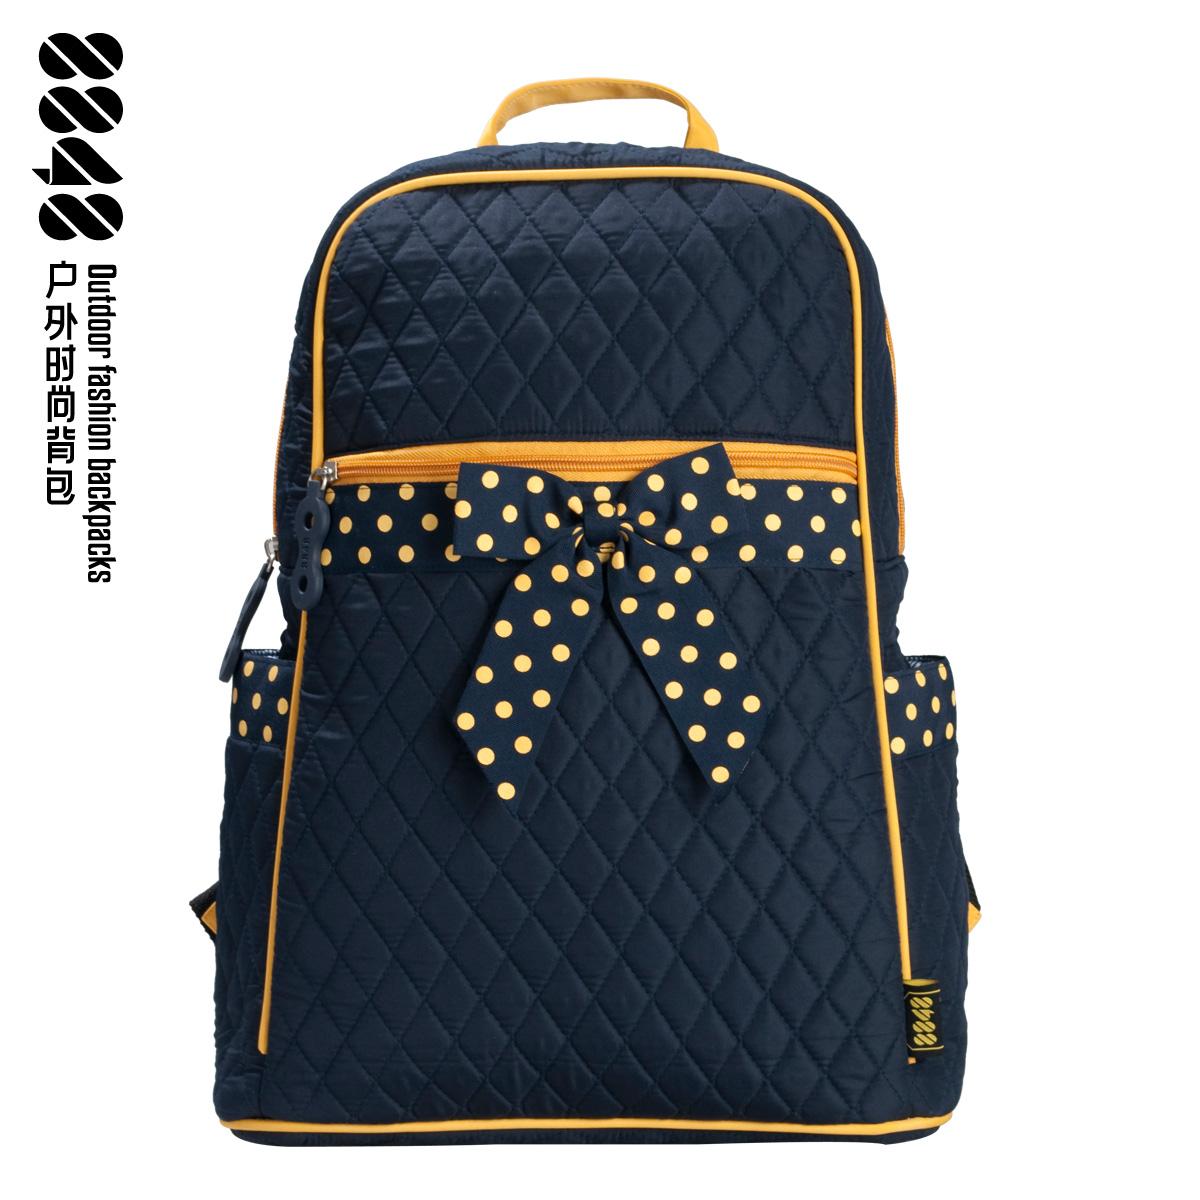 Preppy-style-bow-polka-dot-backpack-women-laptop-bag-middle-school ...